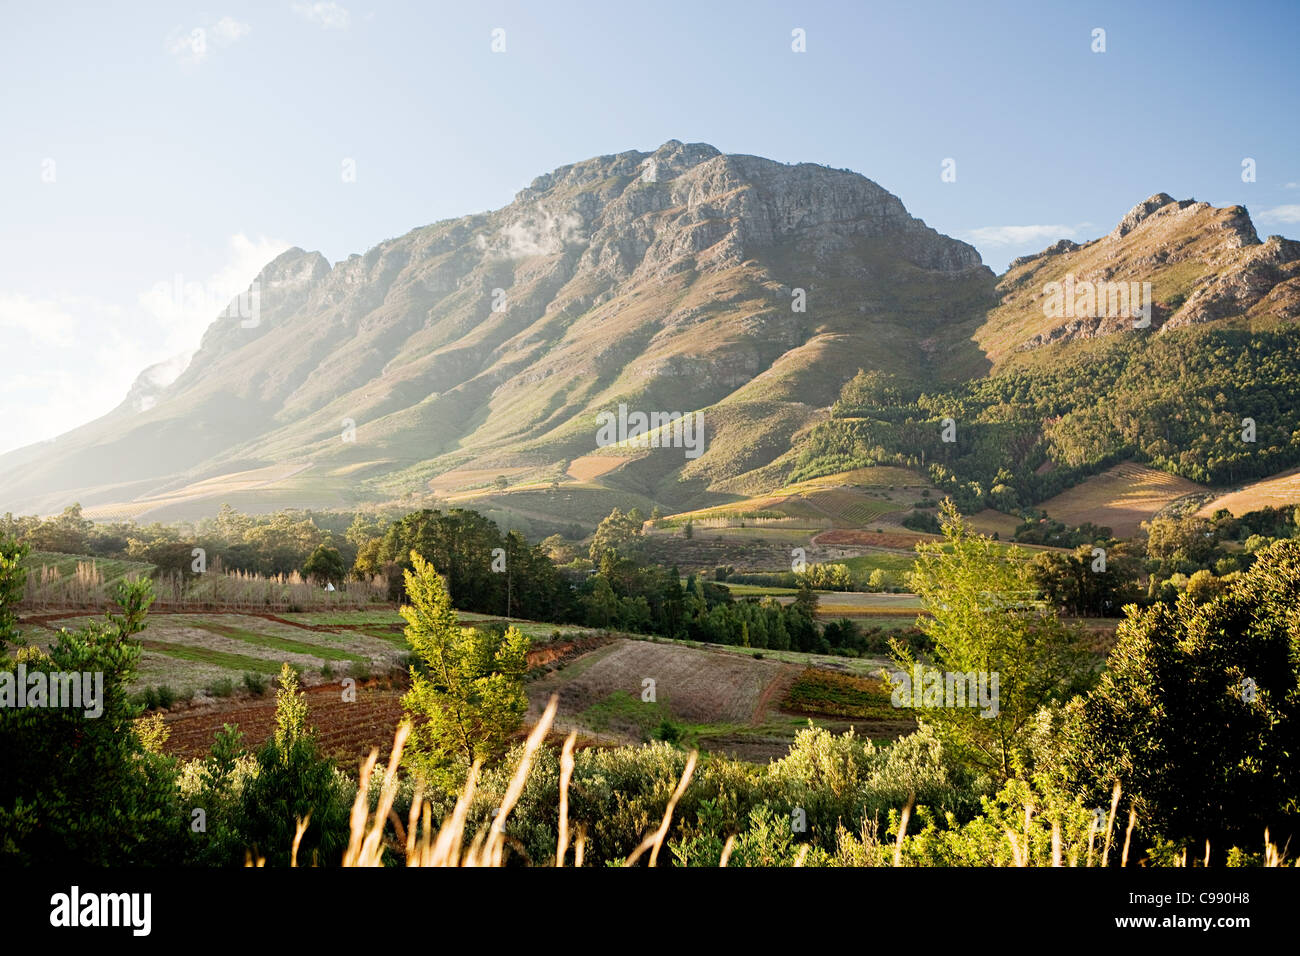 Stellenbosch Mountain, view from Hells Heights Pass, South Africa - Stock Image